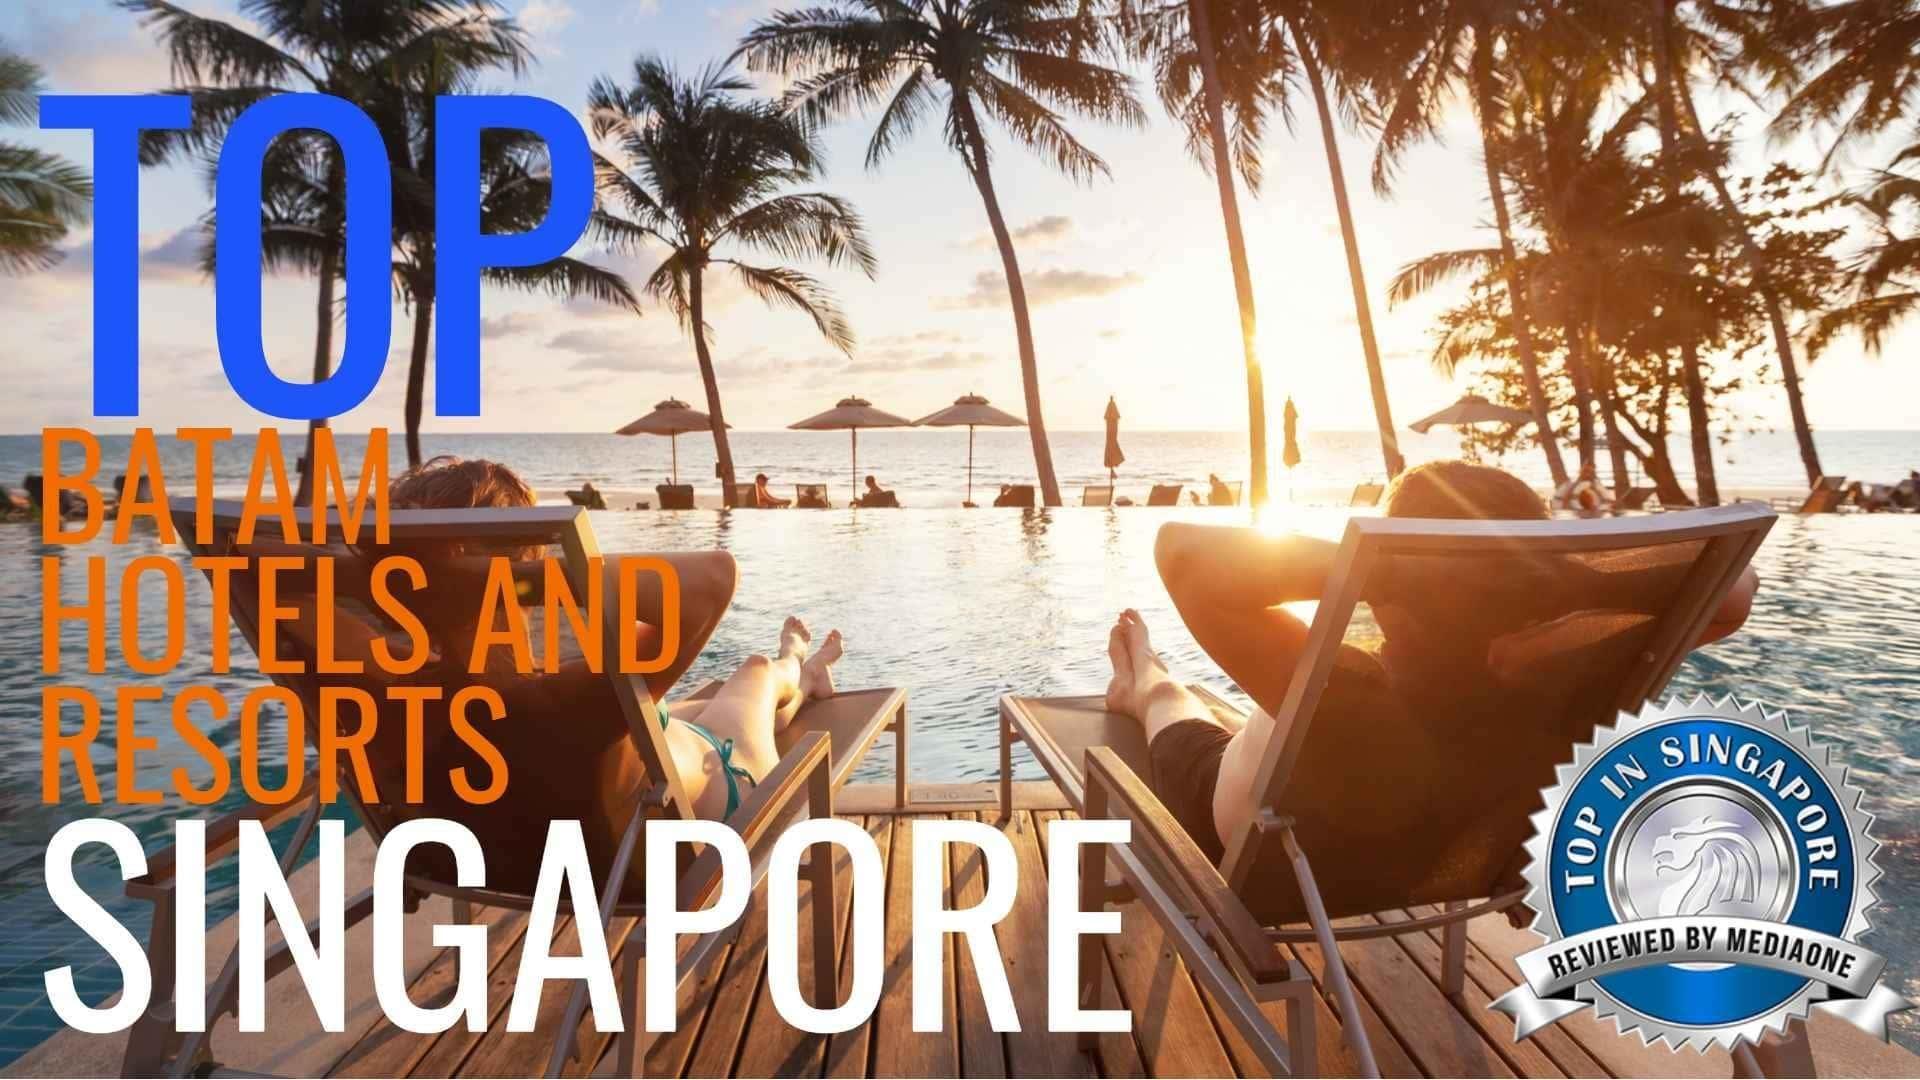 Top Batam Hotels and Resorts